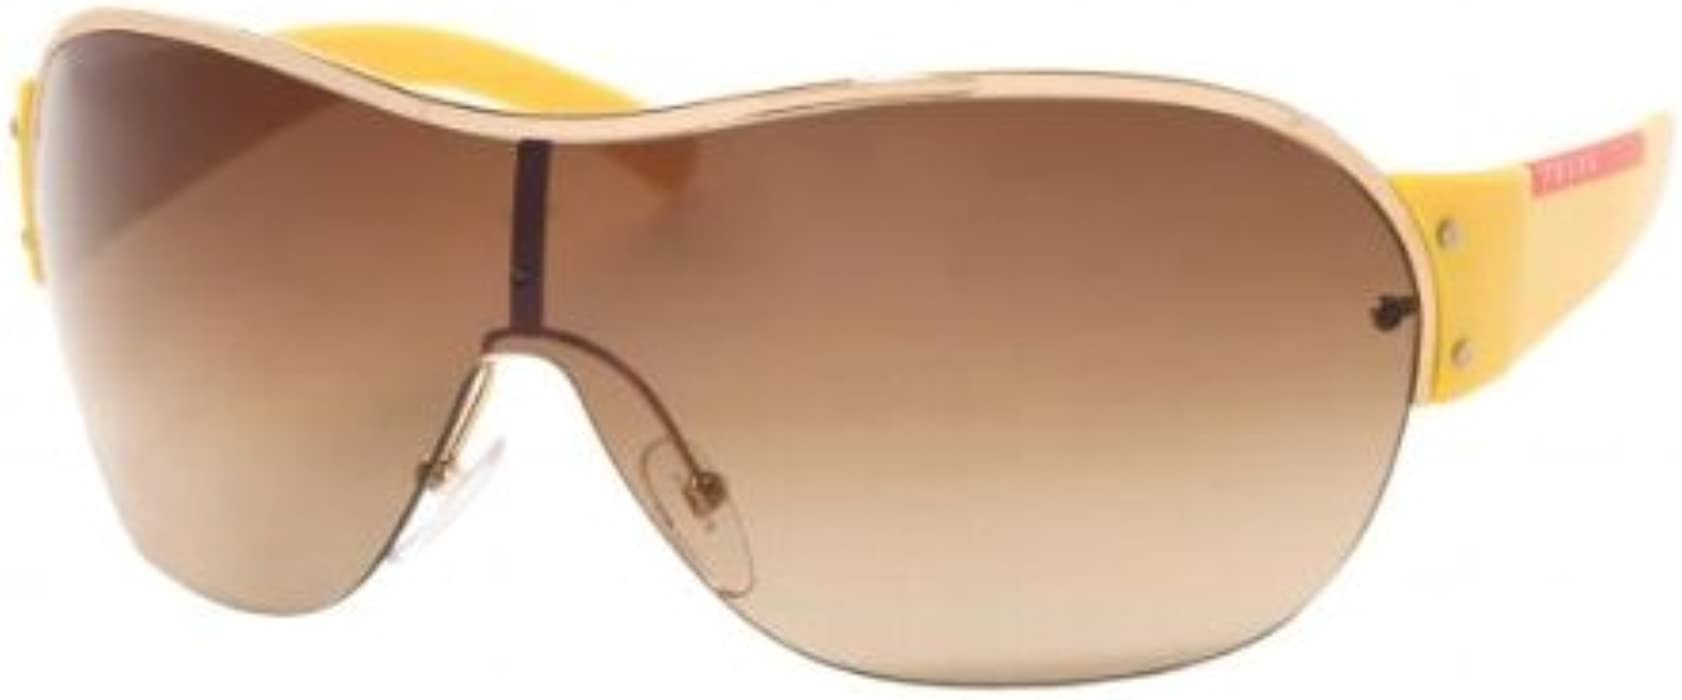 9a2009f6b0ef Prada Sunglasses SPS53G YELLOW   BROWN GRADIENT 5AK6S1 at Amazon ...